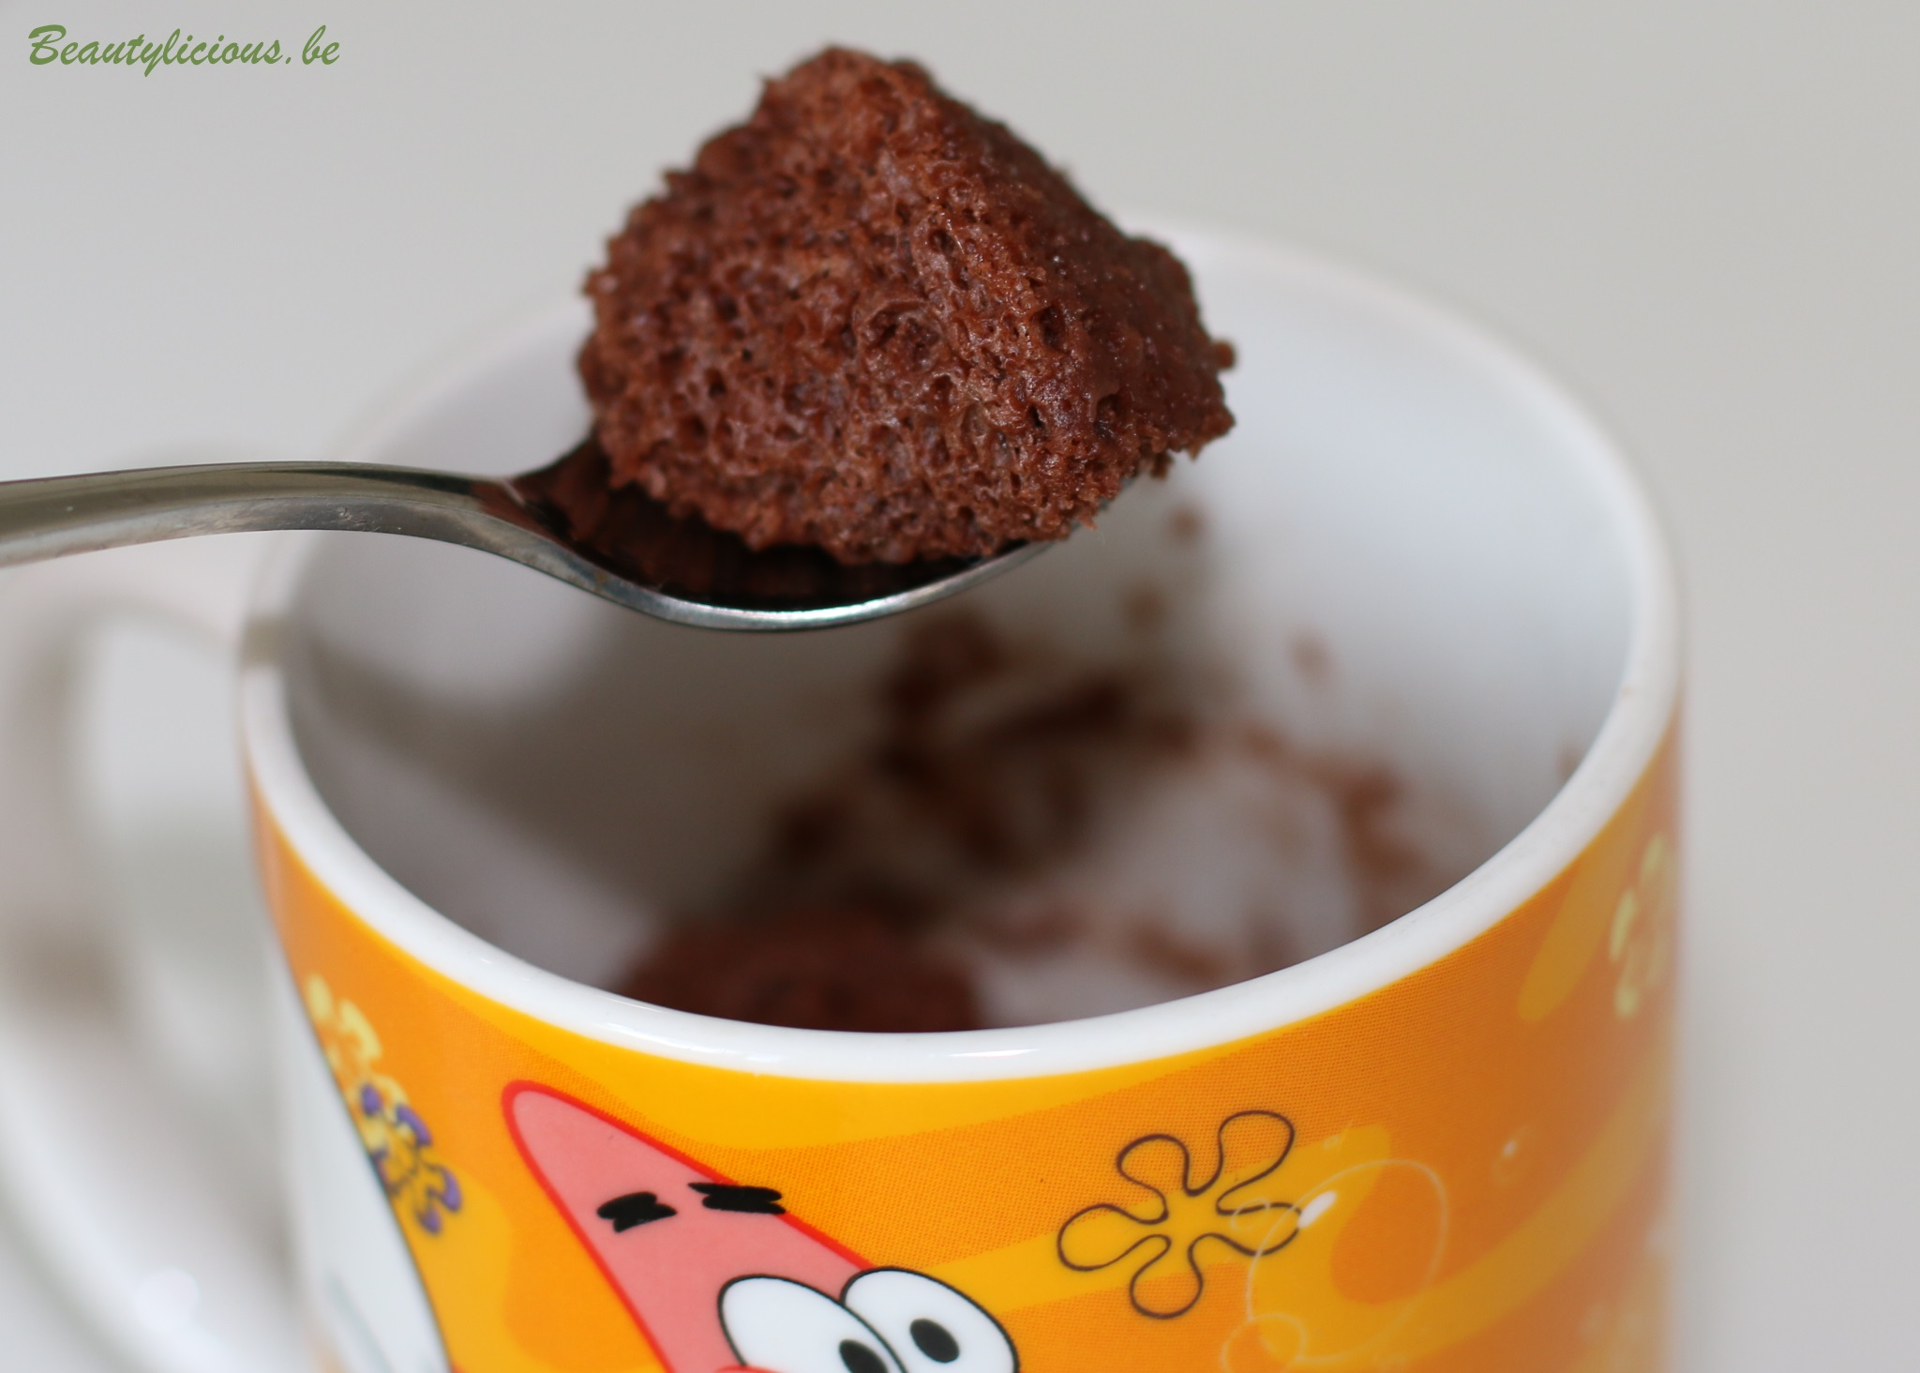 Mug Cake Chocolat Du D Ef Bf Bdner Presque Parfait